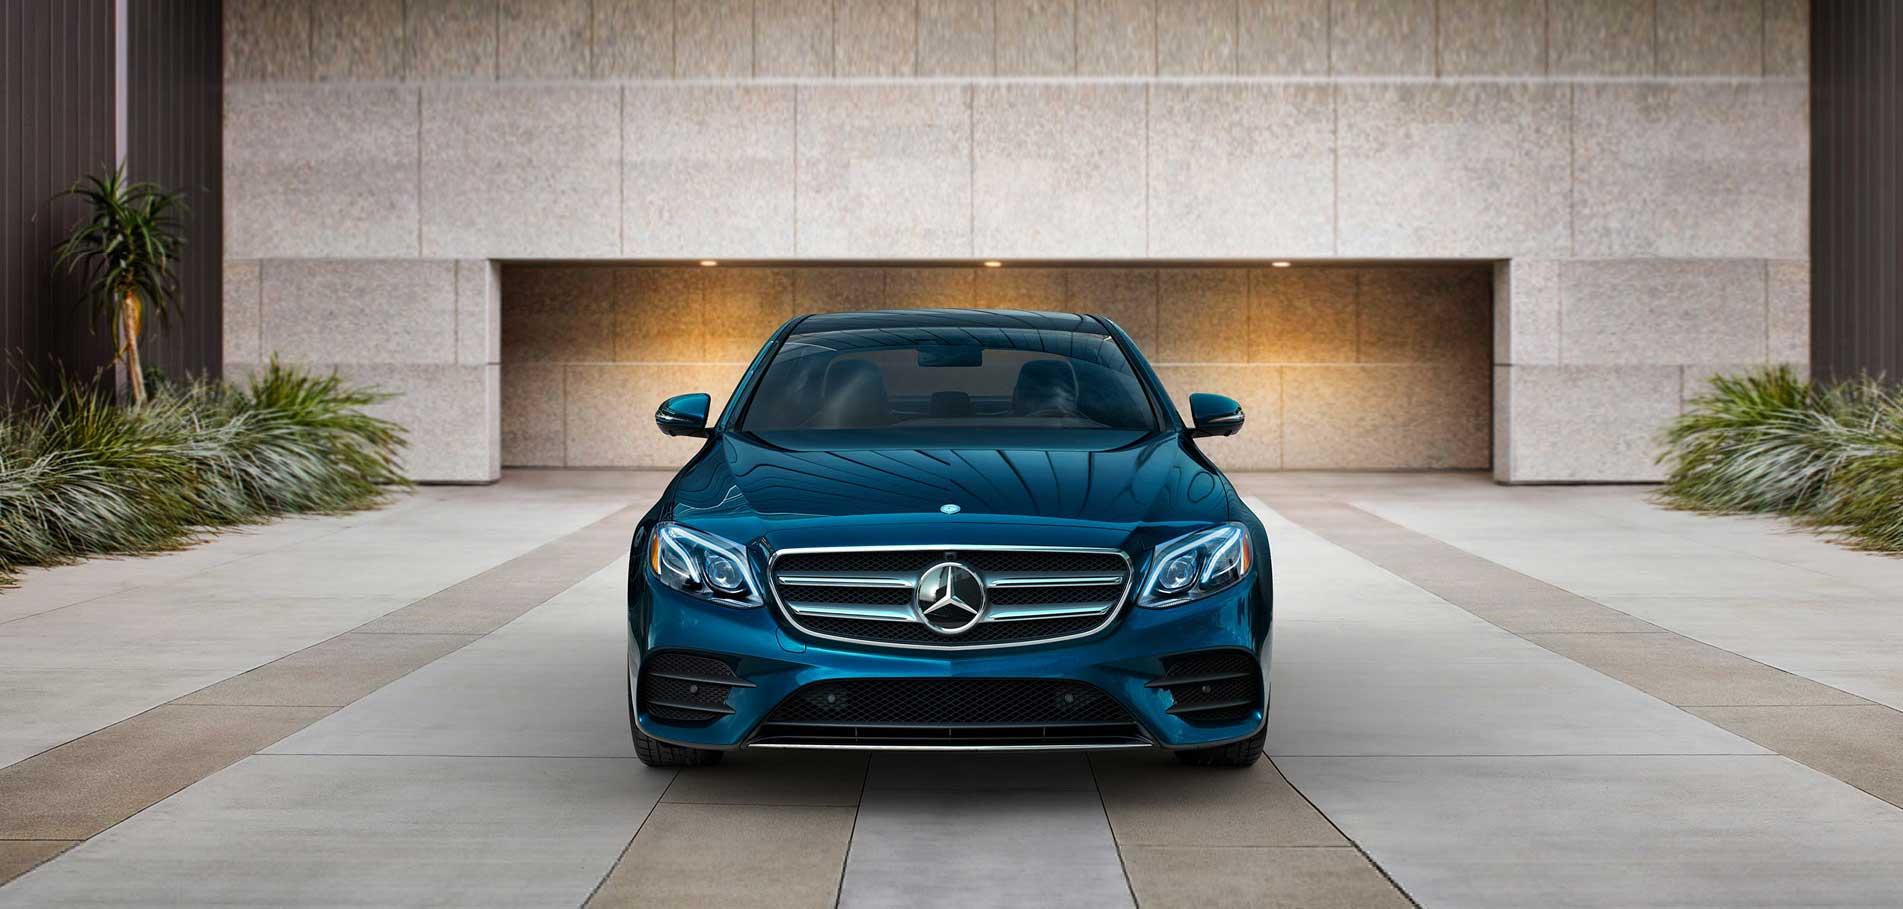 Mercedes benz dealership bronx ny fiat world test drive for Mercedes benz dealer in brooklyn